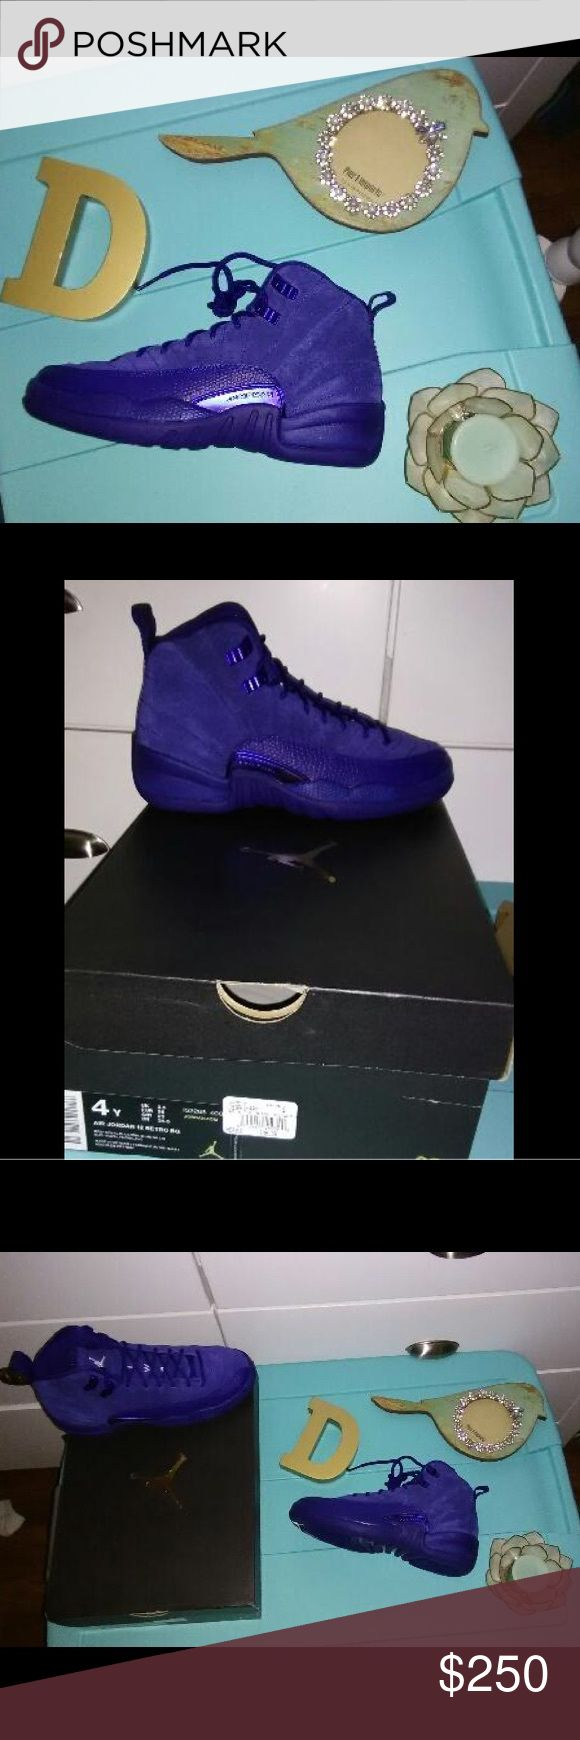 Jordan retro deep Royal Blue 12s Brand new pair of Jordan's retro 12s deep Royal Blues youth size 4 Jordan Shoes Sneakers